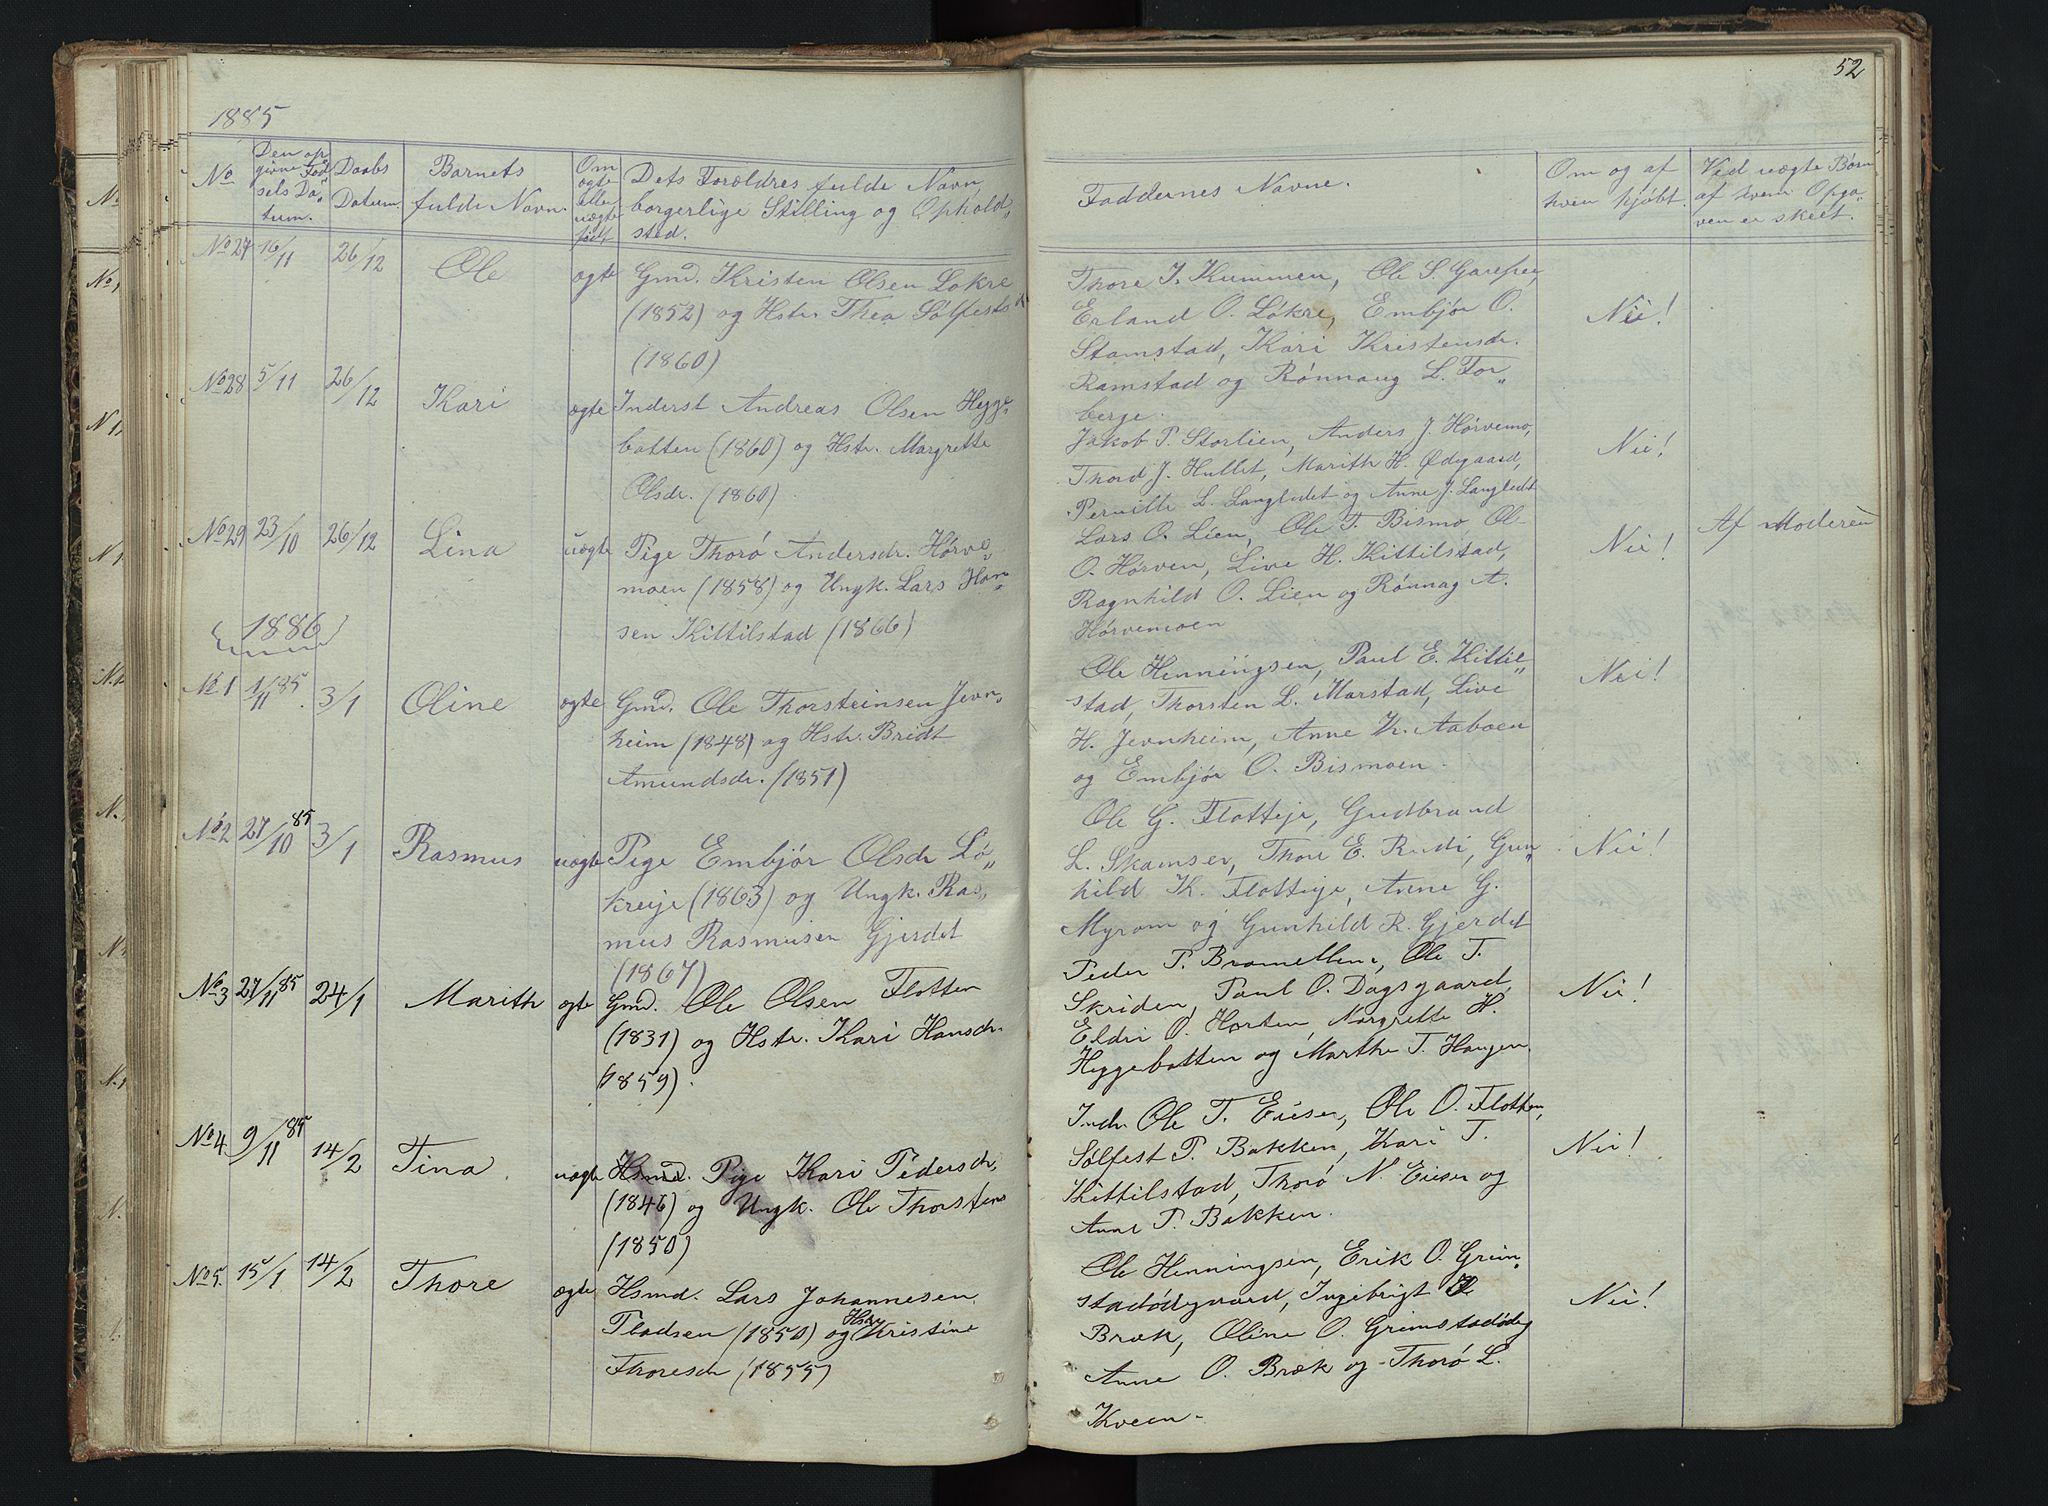 SAH, Skjåk prestekontor, Klokkerbok nr. 2, 1867-1894, s. 52